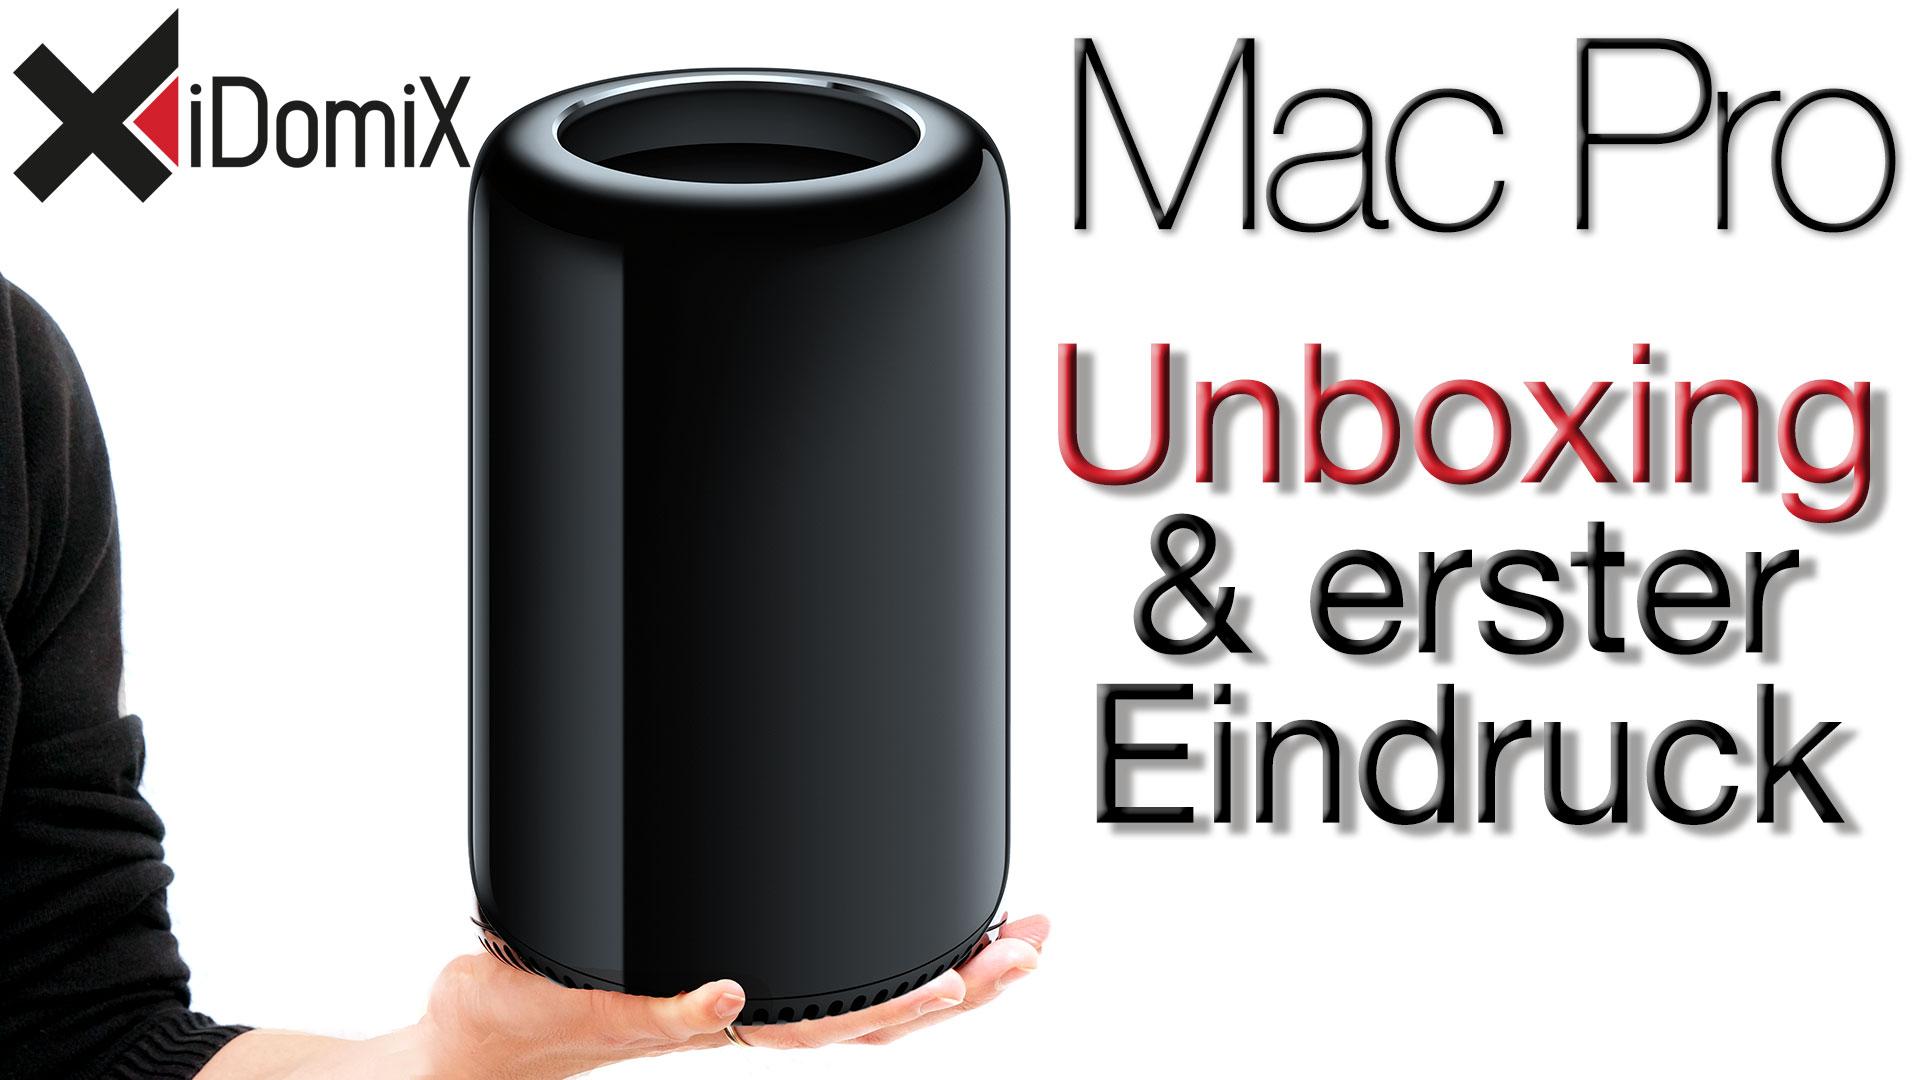 Mac Pro 2013 Unboxing & Erster Eindruck